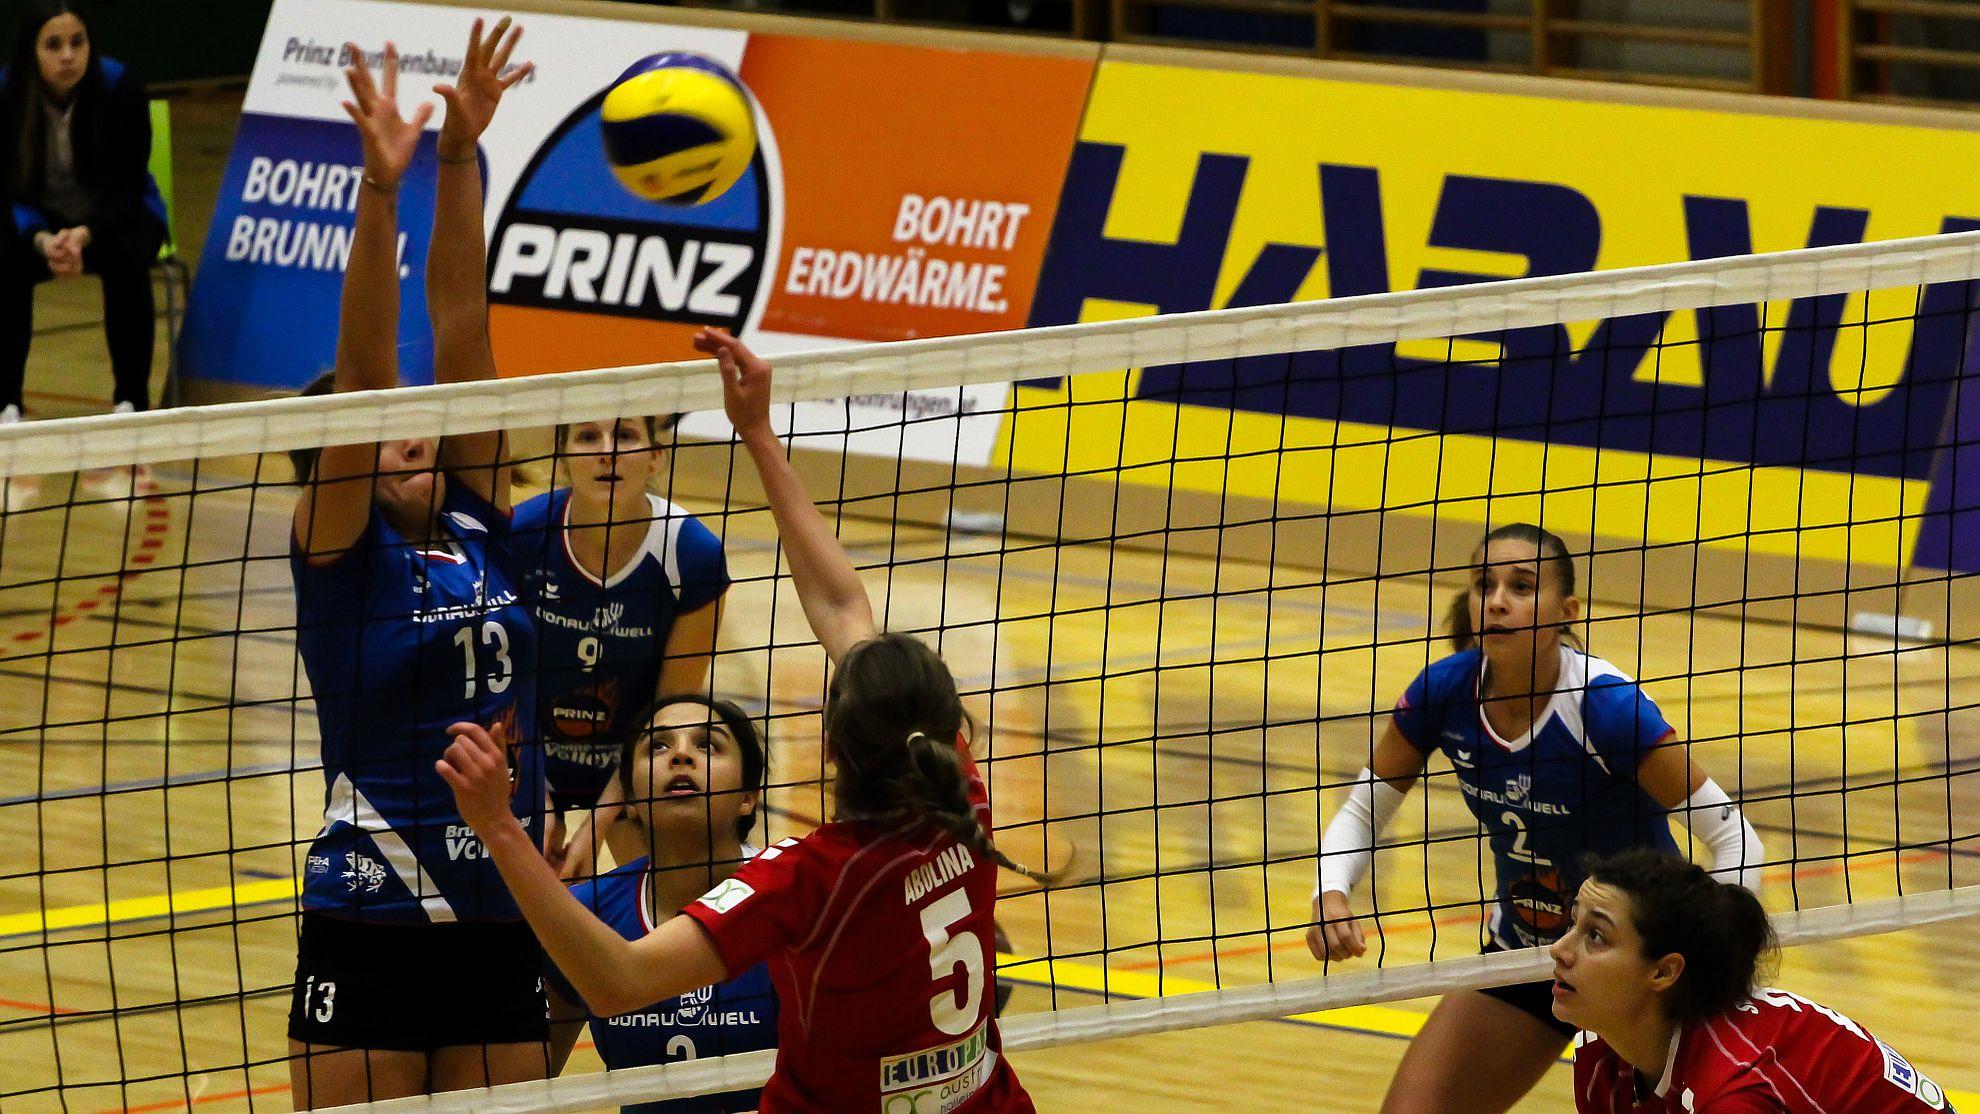 SG Prinz Brunnenbau Volleys 2018/19 - FOTO © Peter Maurer